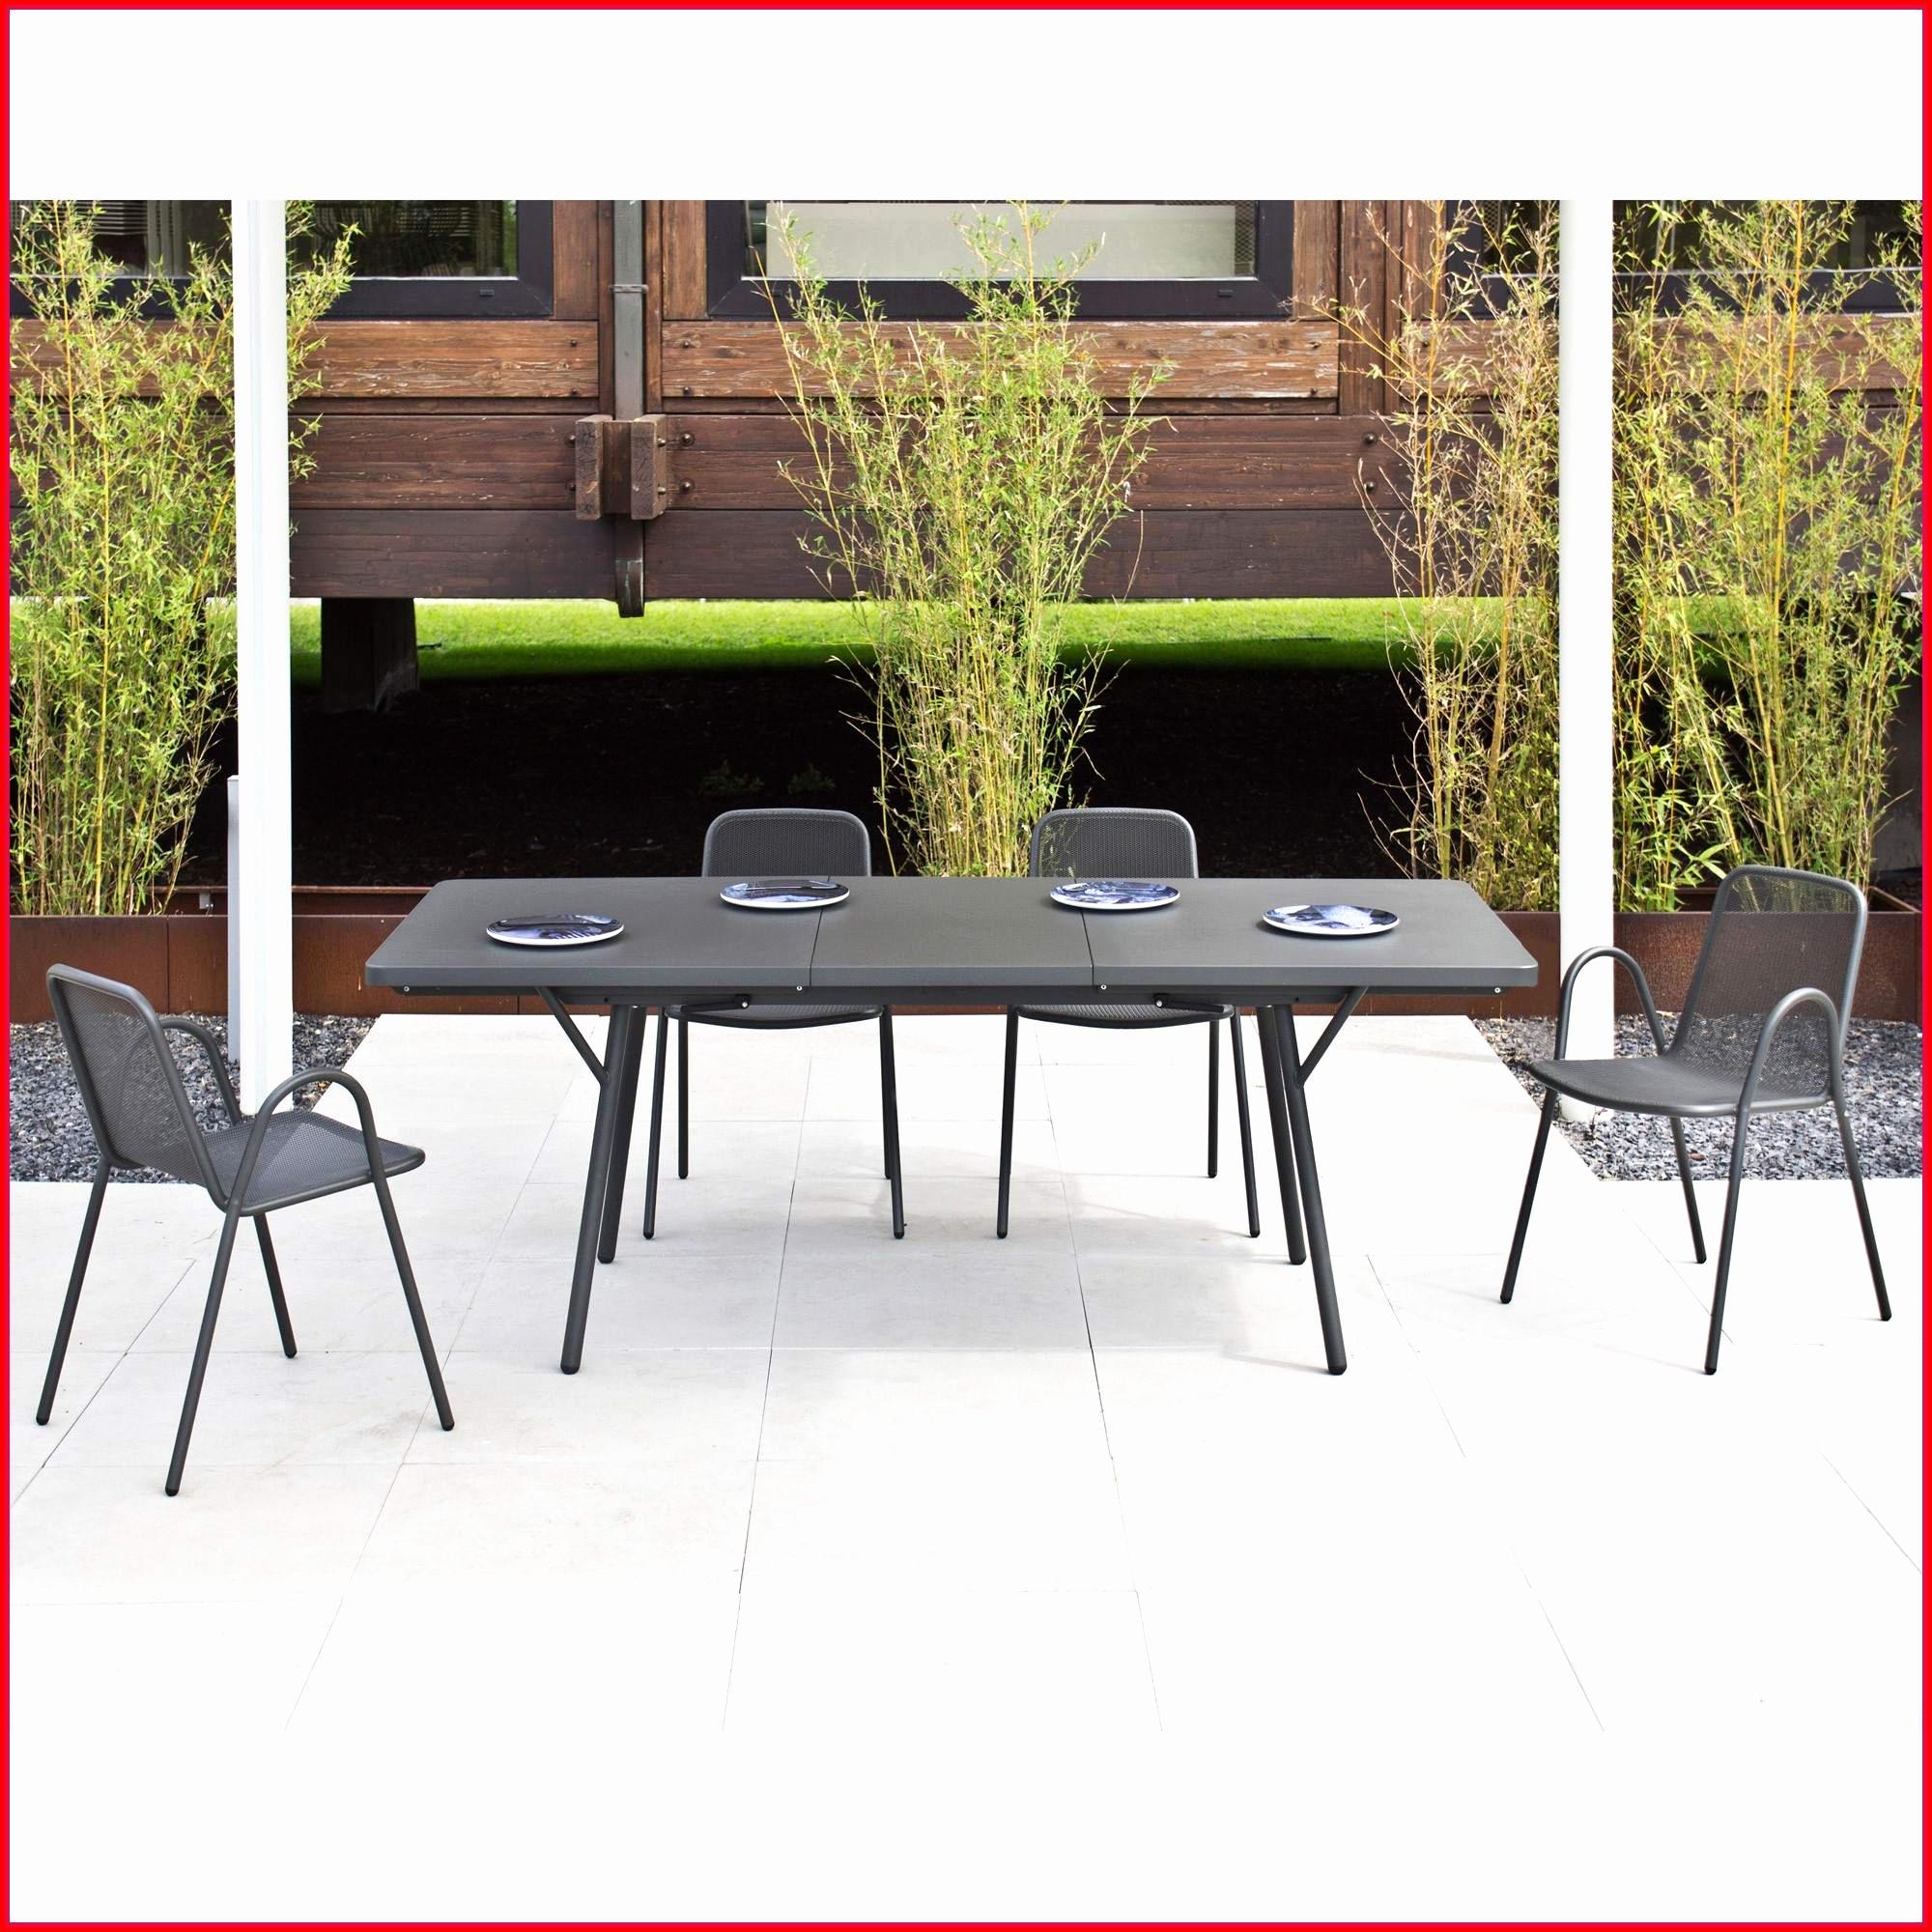 salon jardin bricorama inspirant 25 brise vue bricorama of salon jardin bricorama